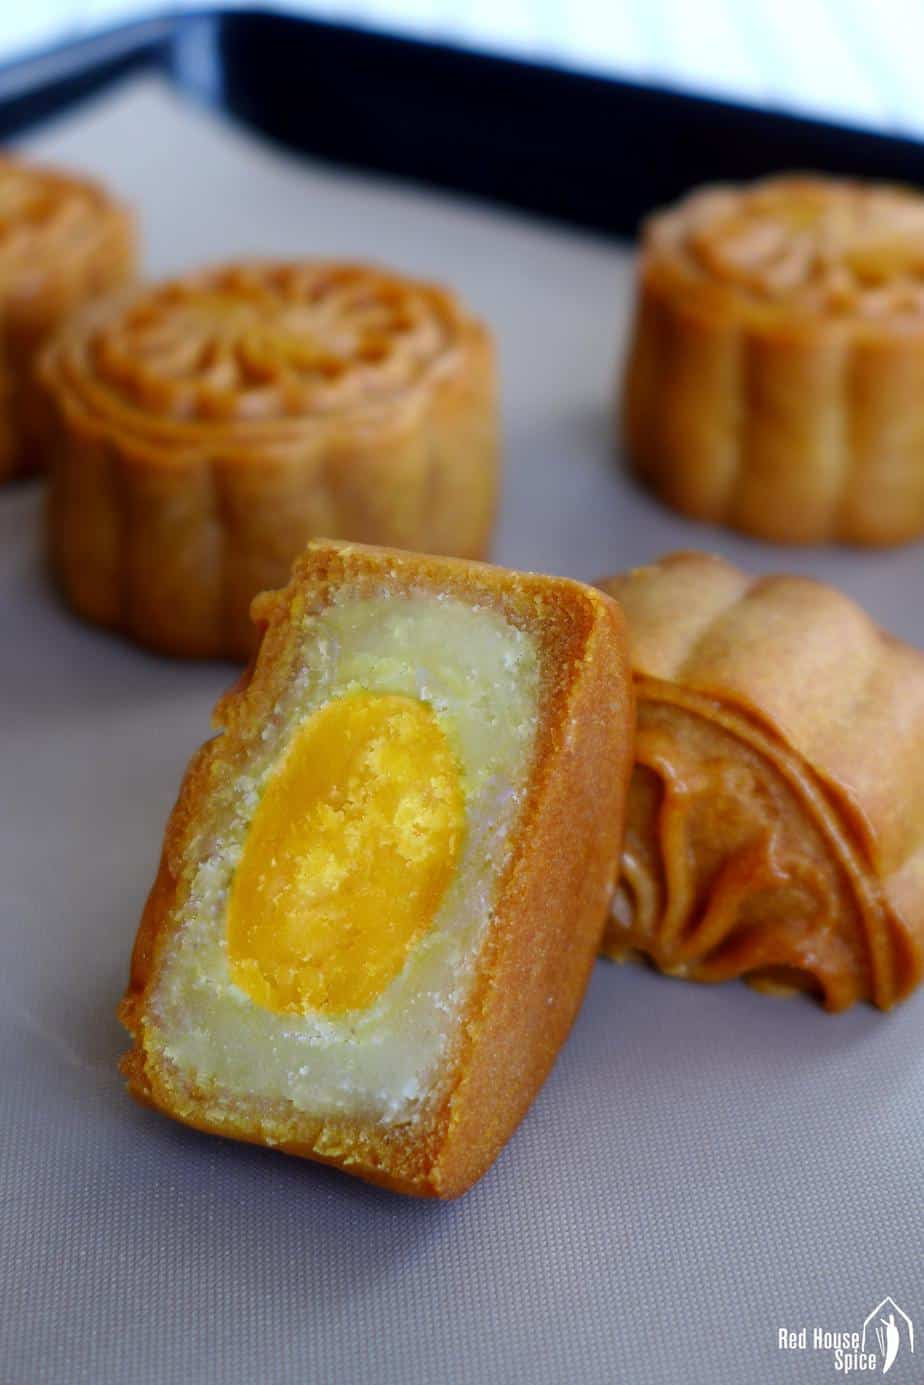 A halved mooncake showing the salted egg yolk filling